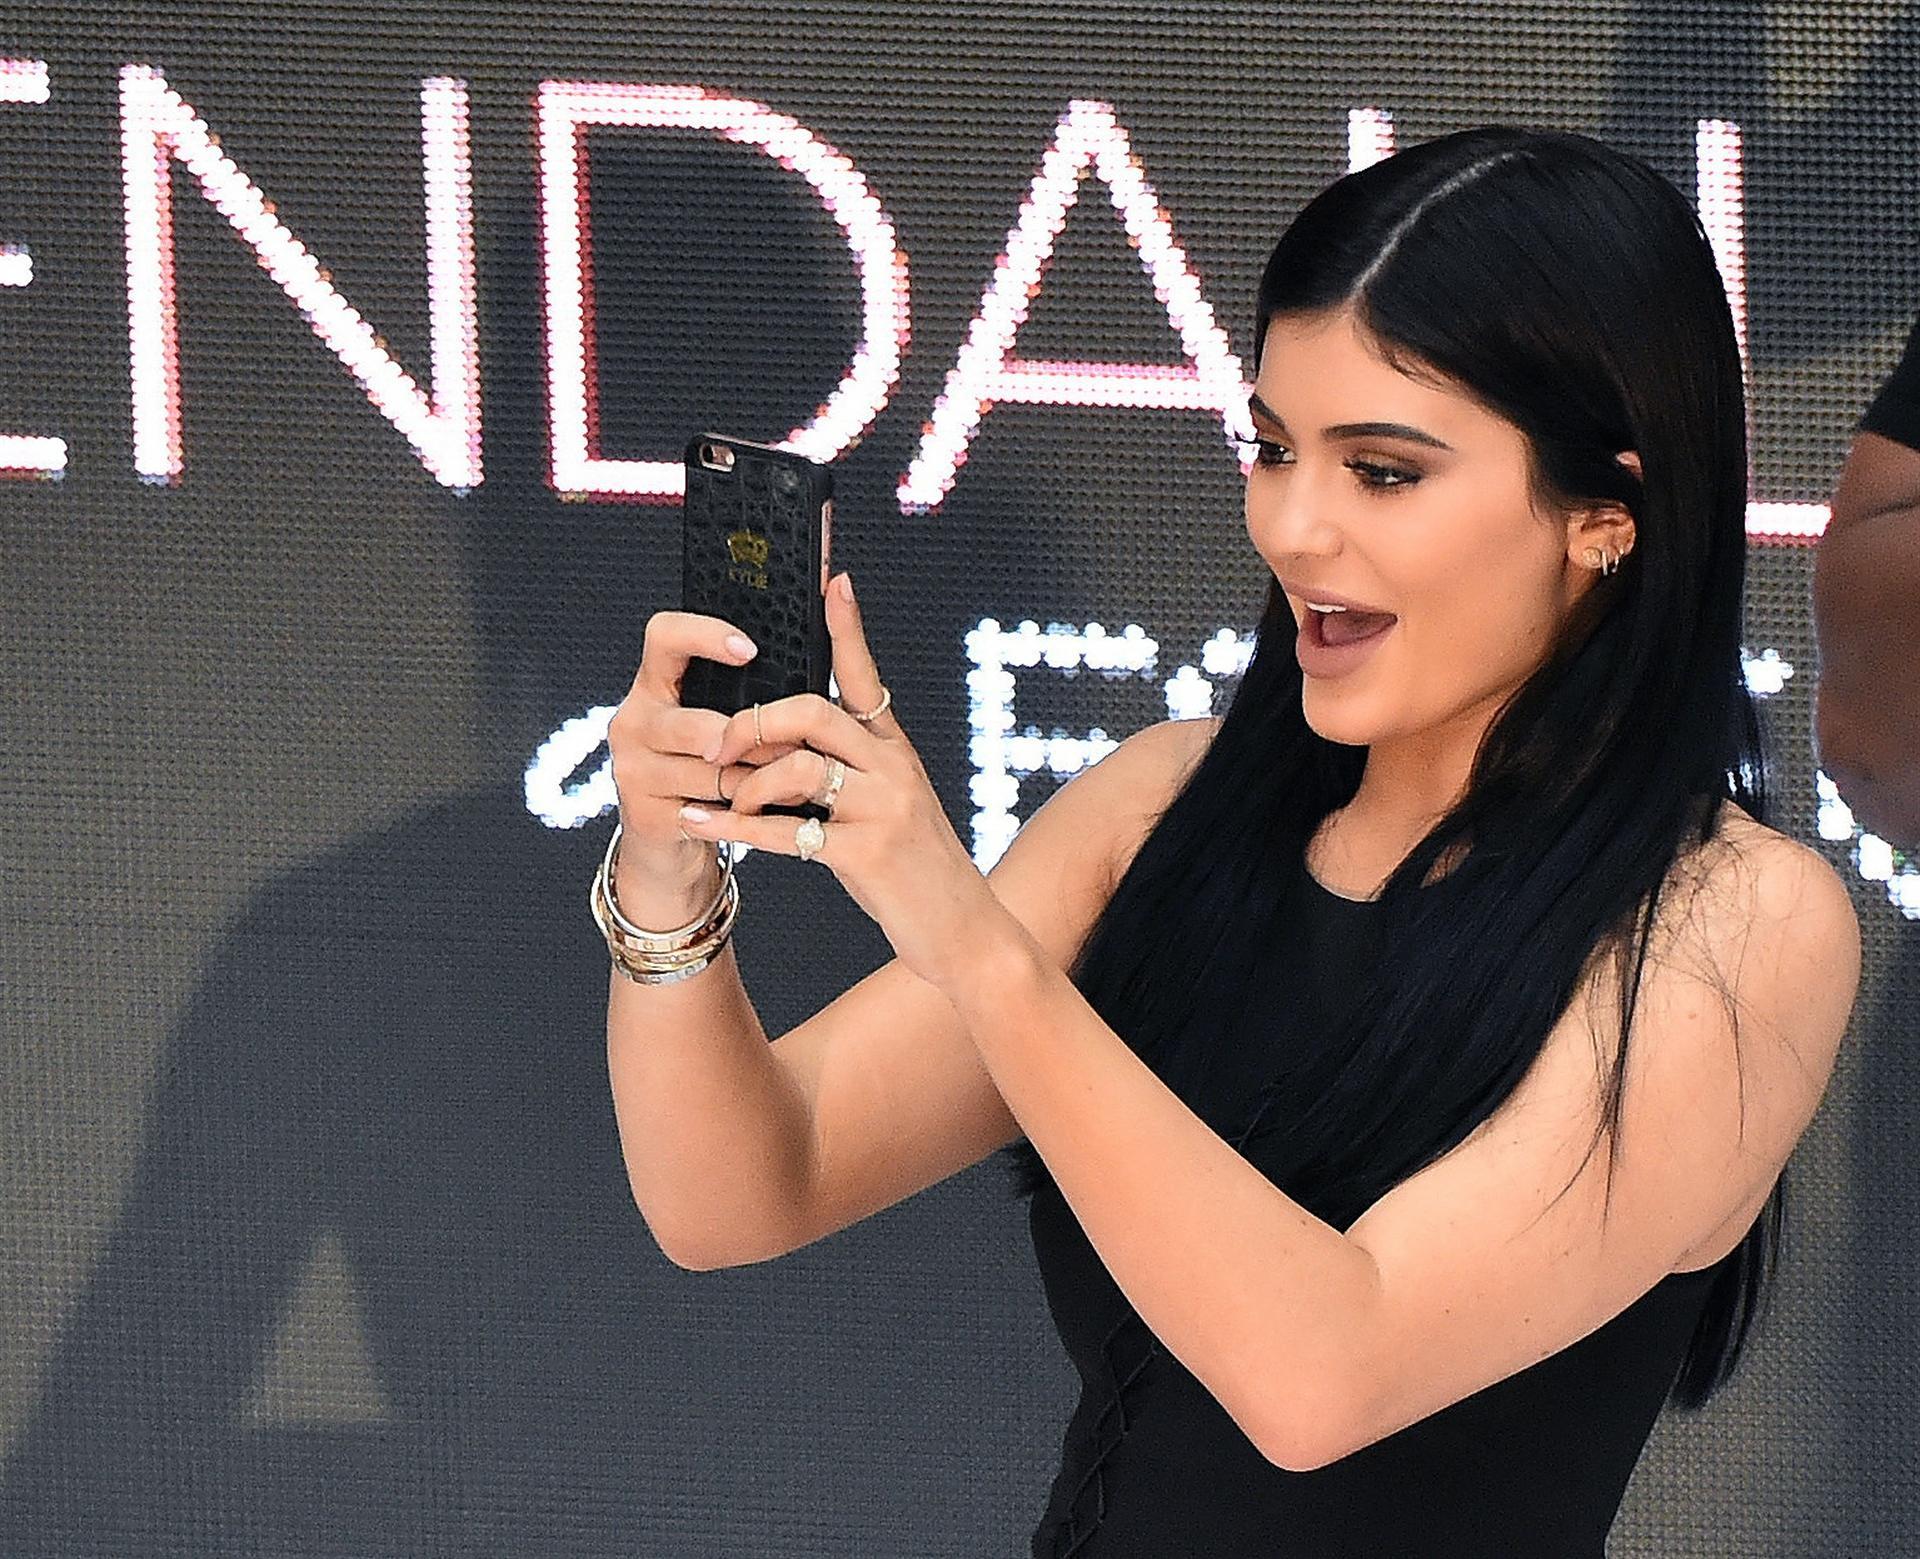 kylie jenner selfie